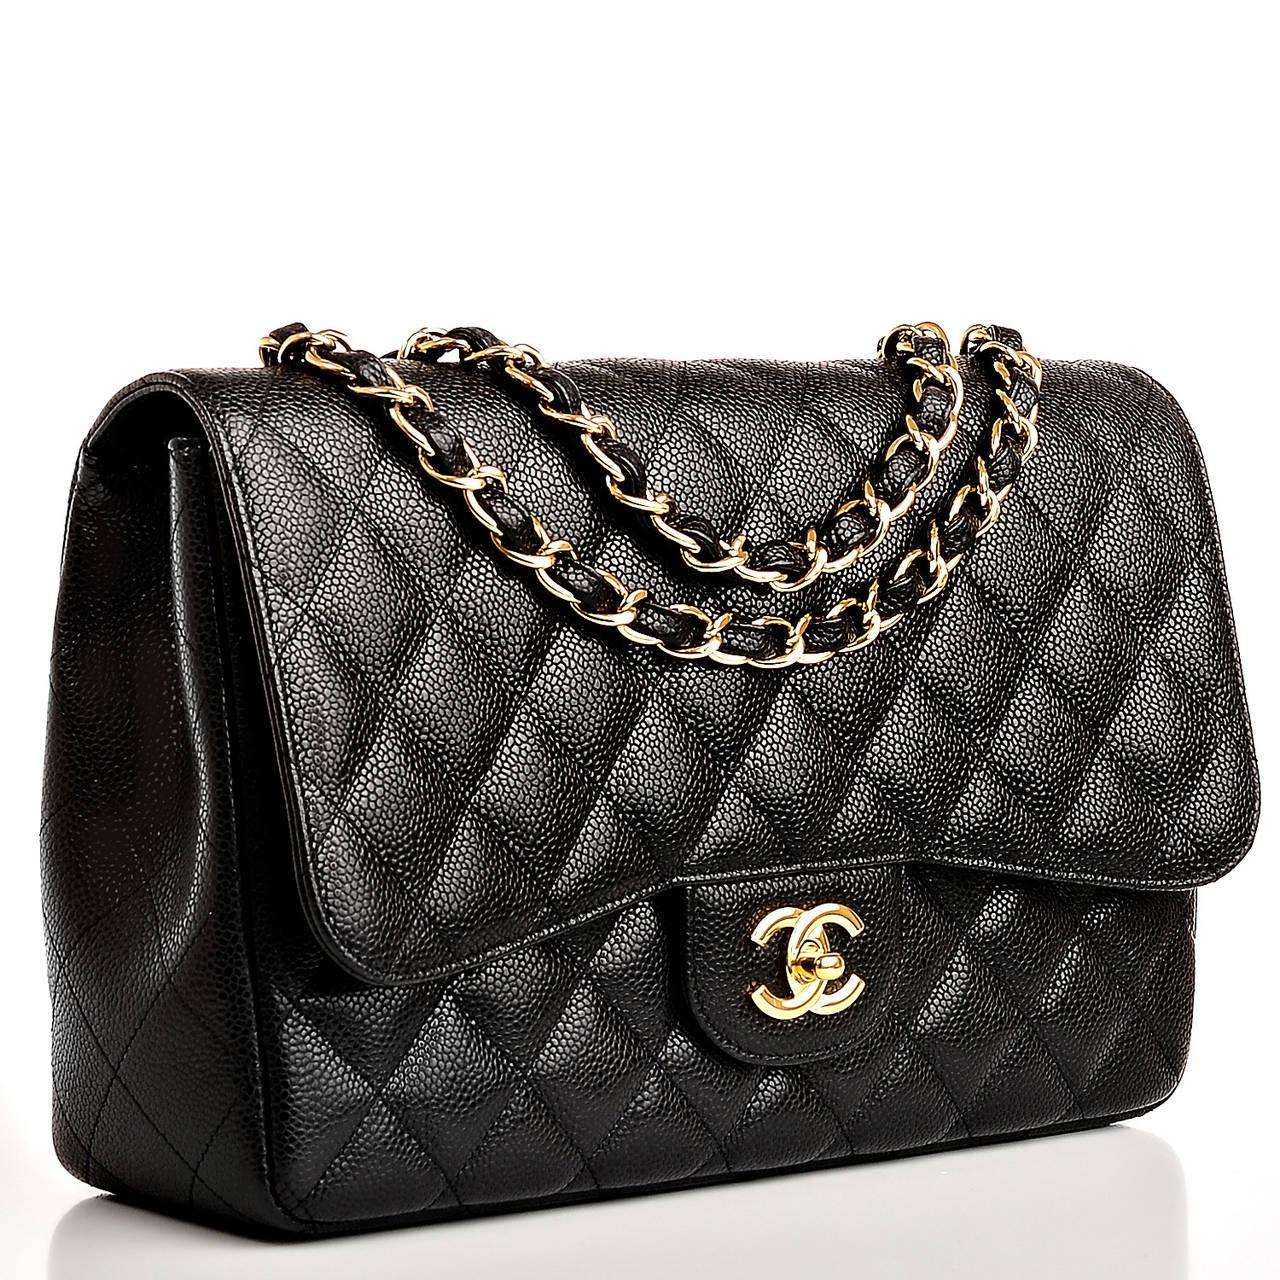 Chanel Classic Jumbo Flap Bag Price